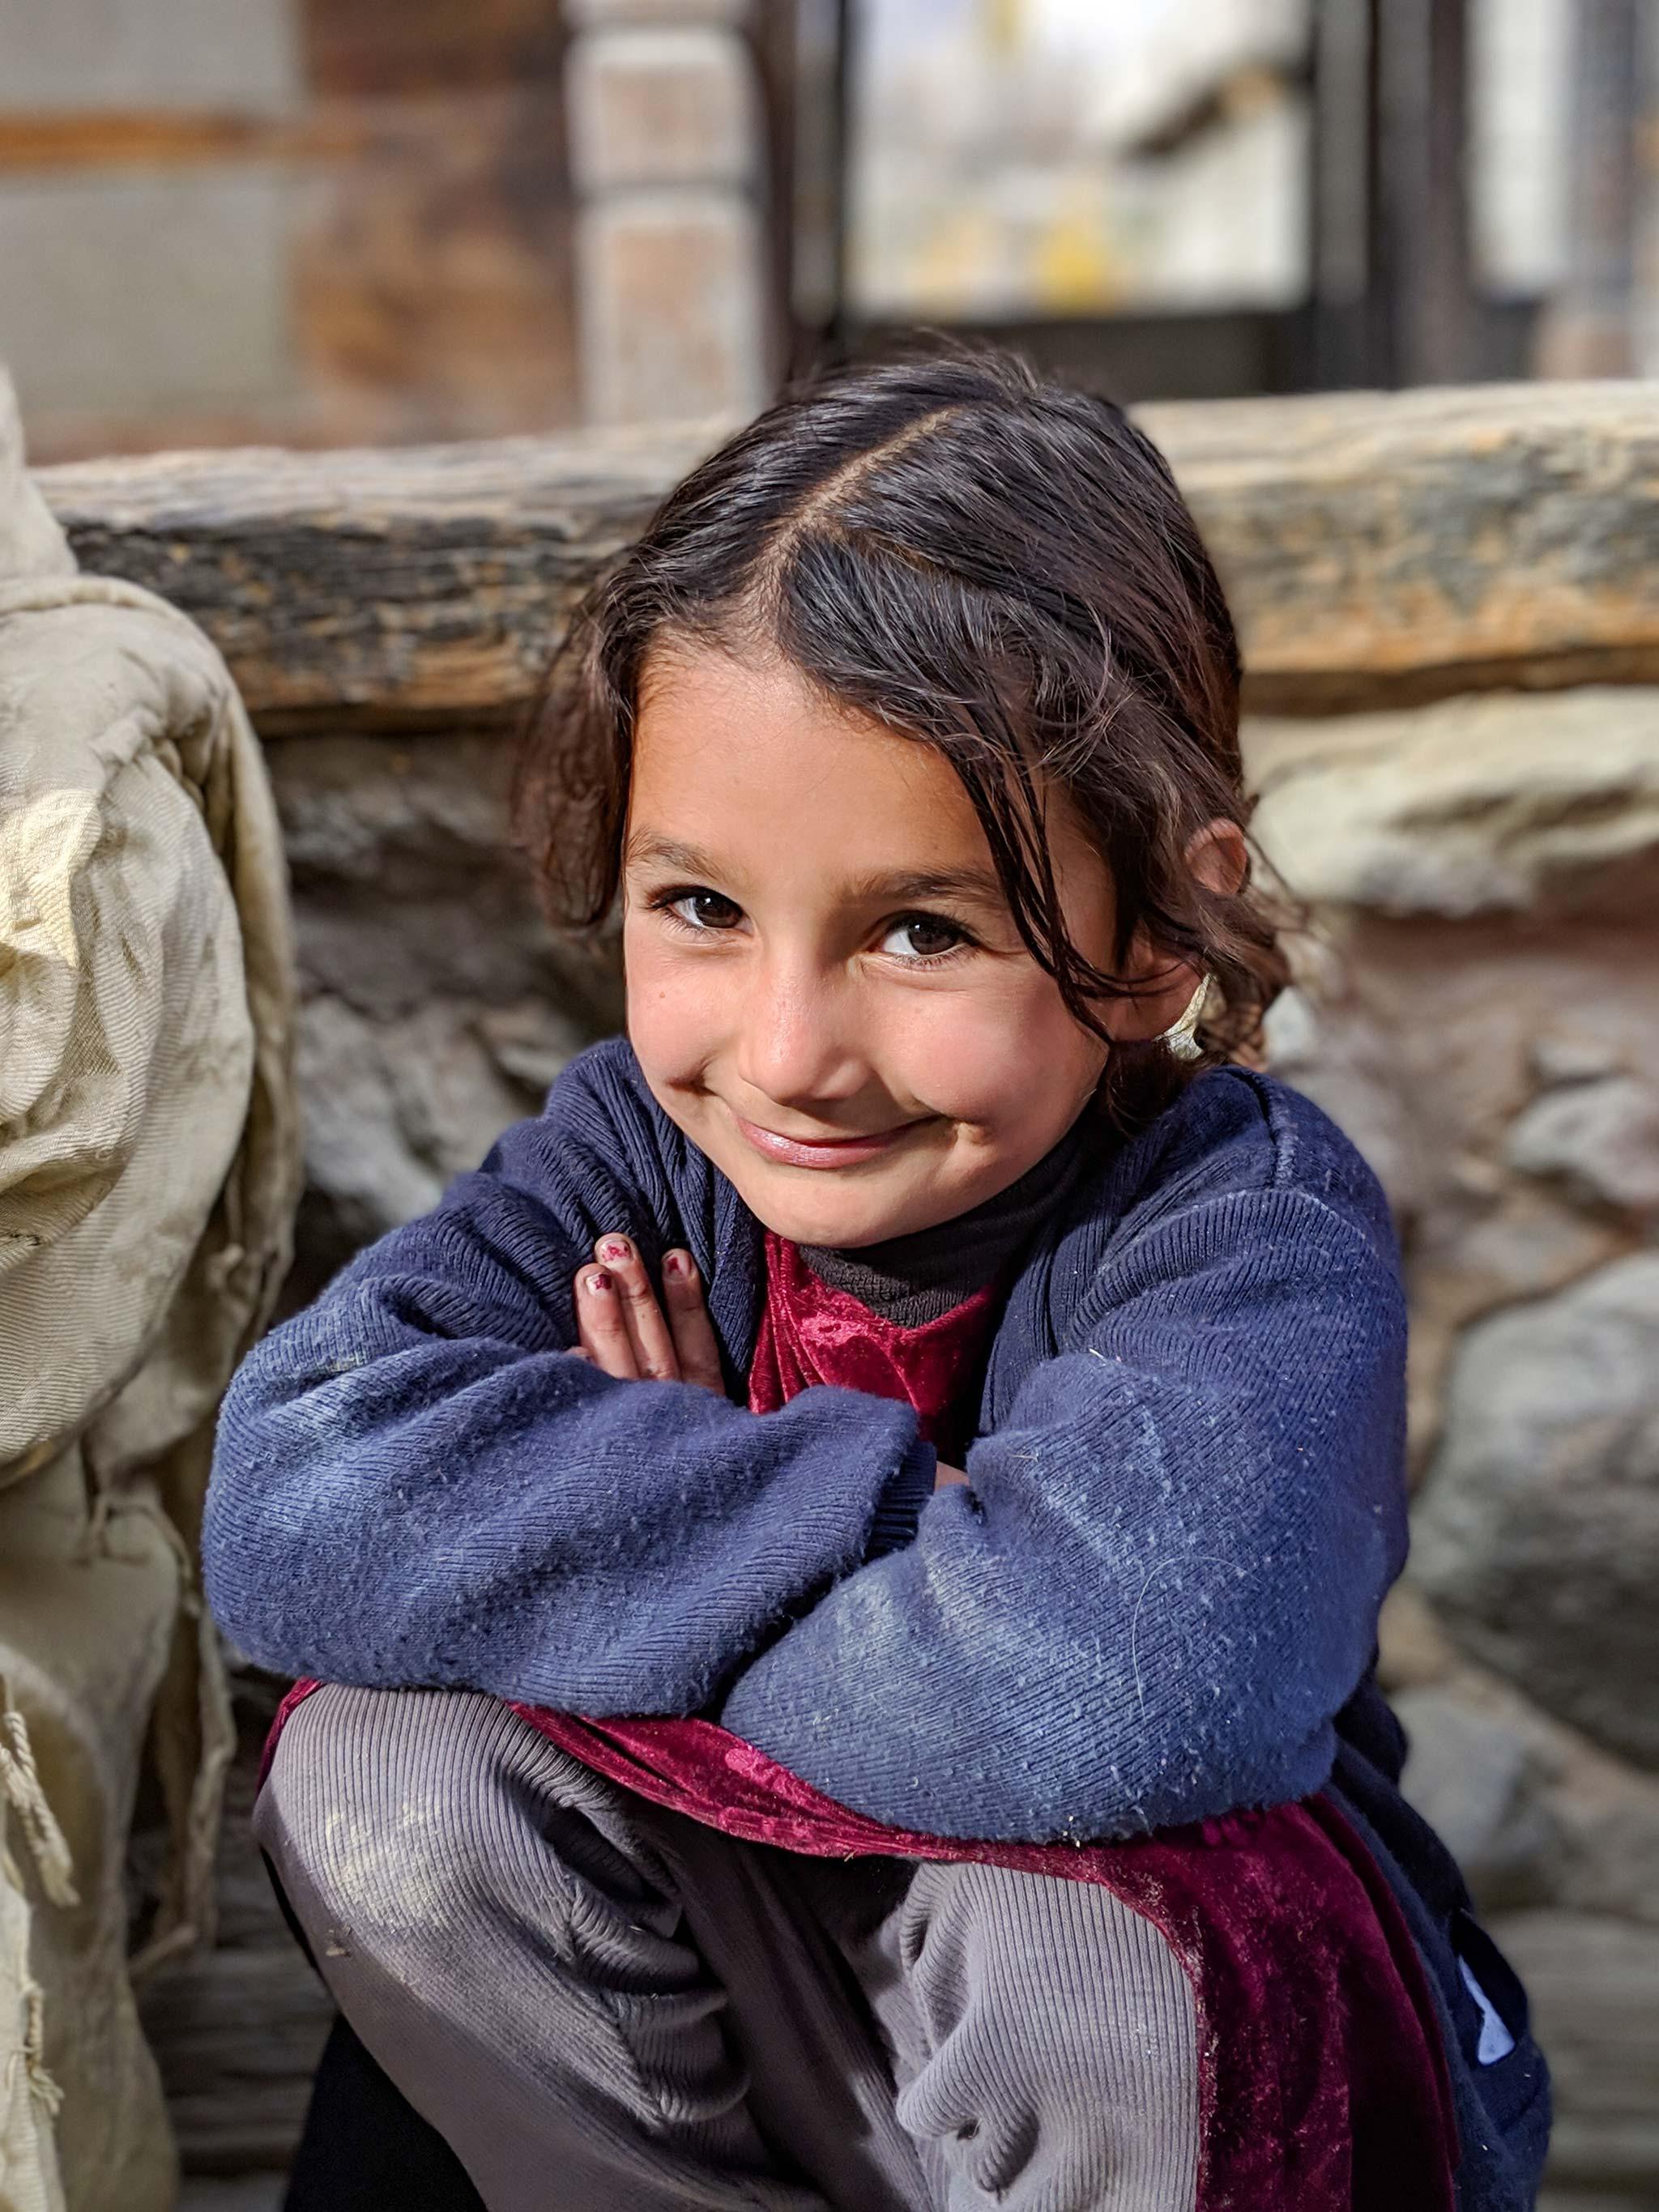 Pakistan's-Eyes-26.jpg